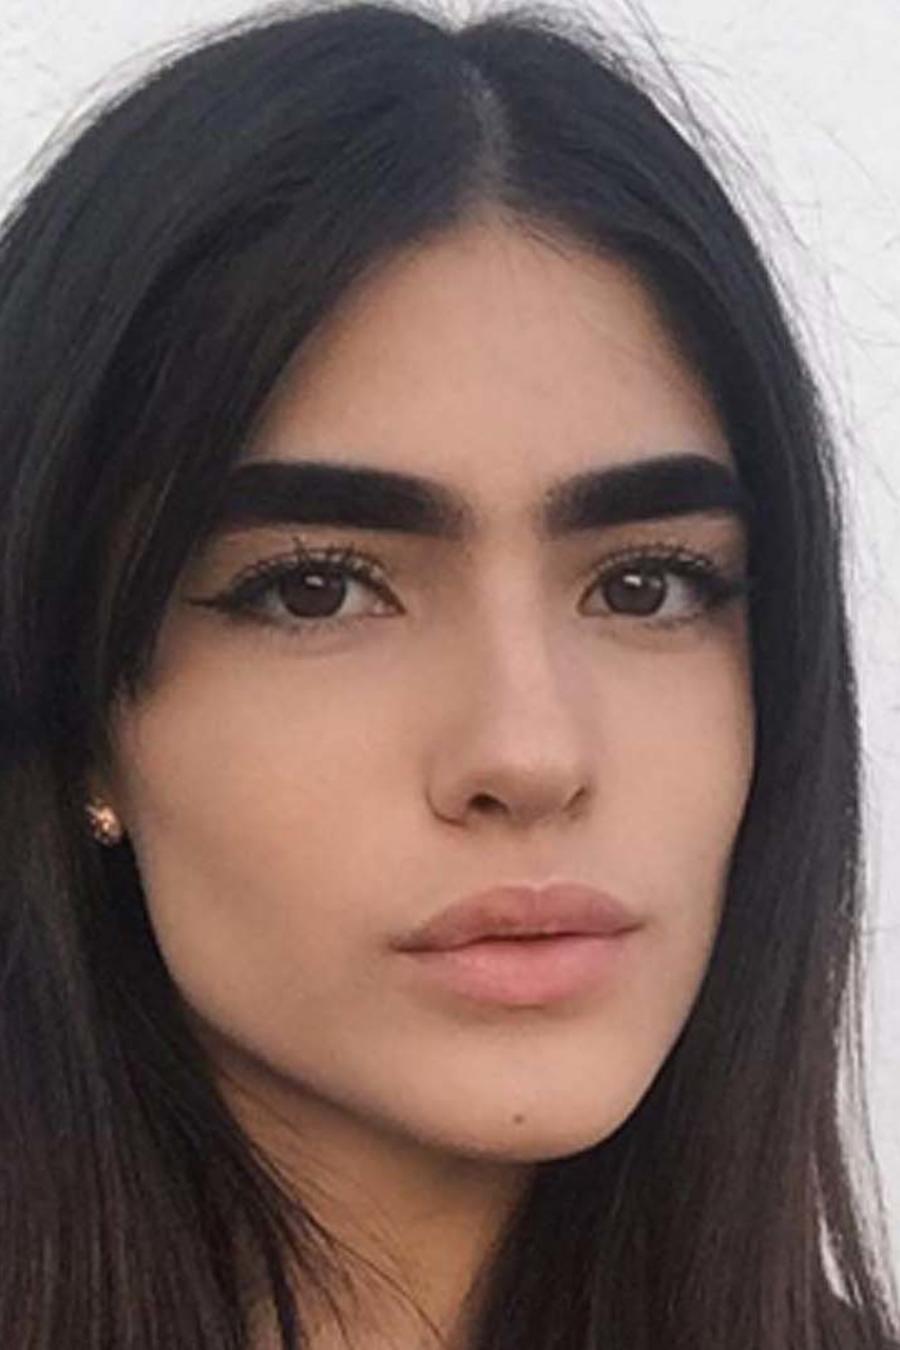 Natalia Castellar selfie